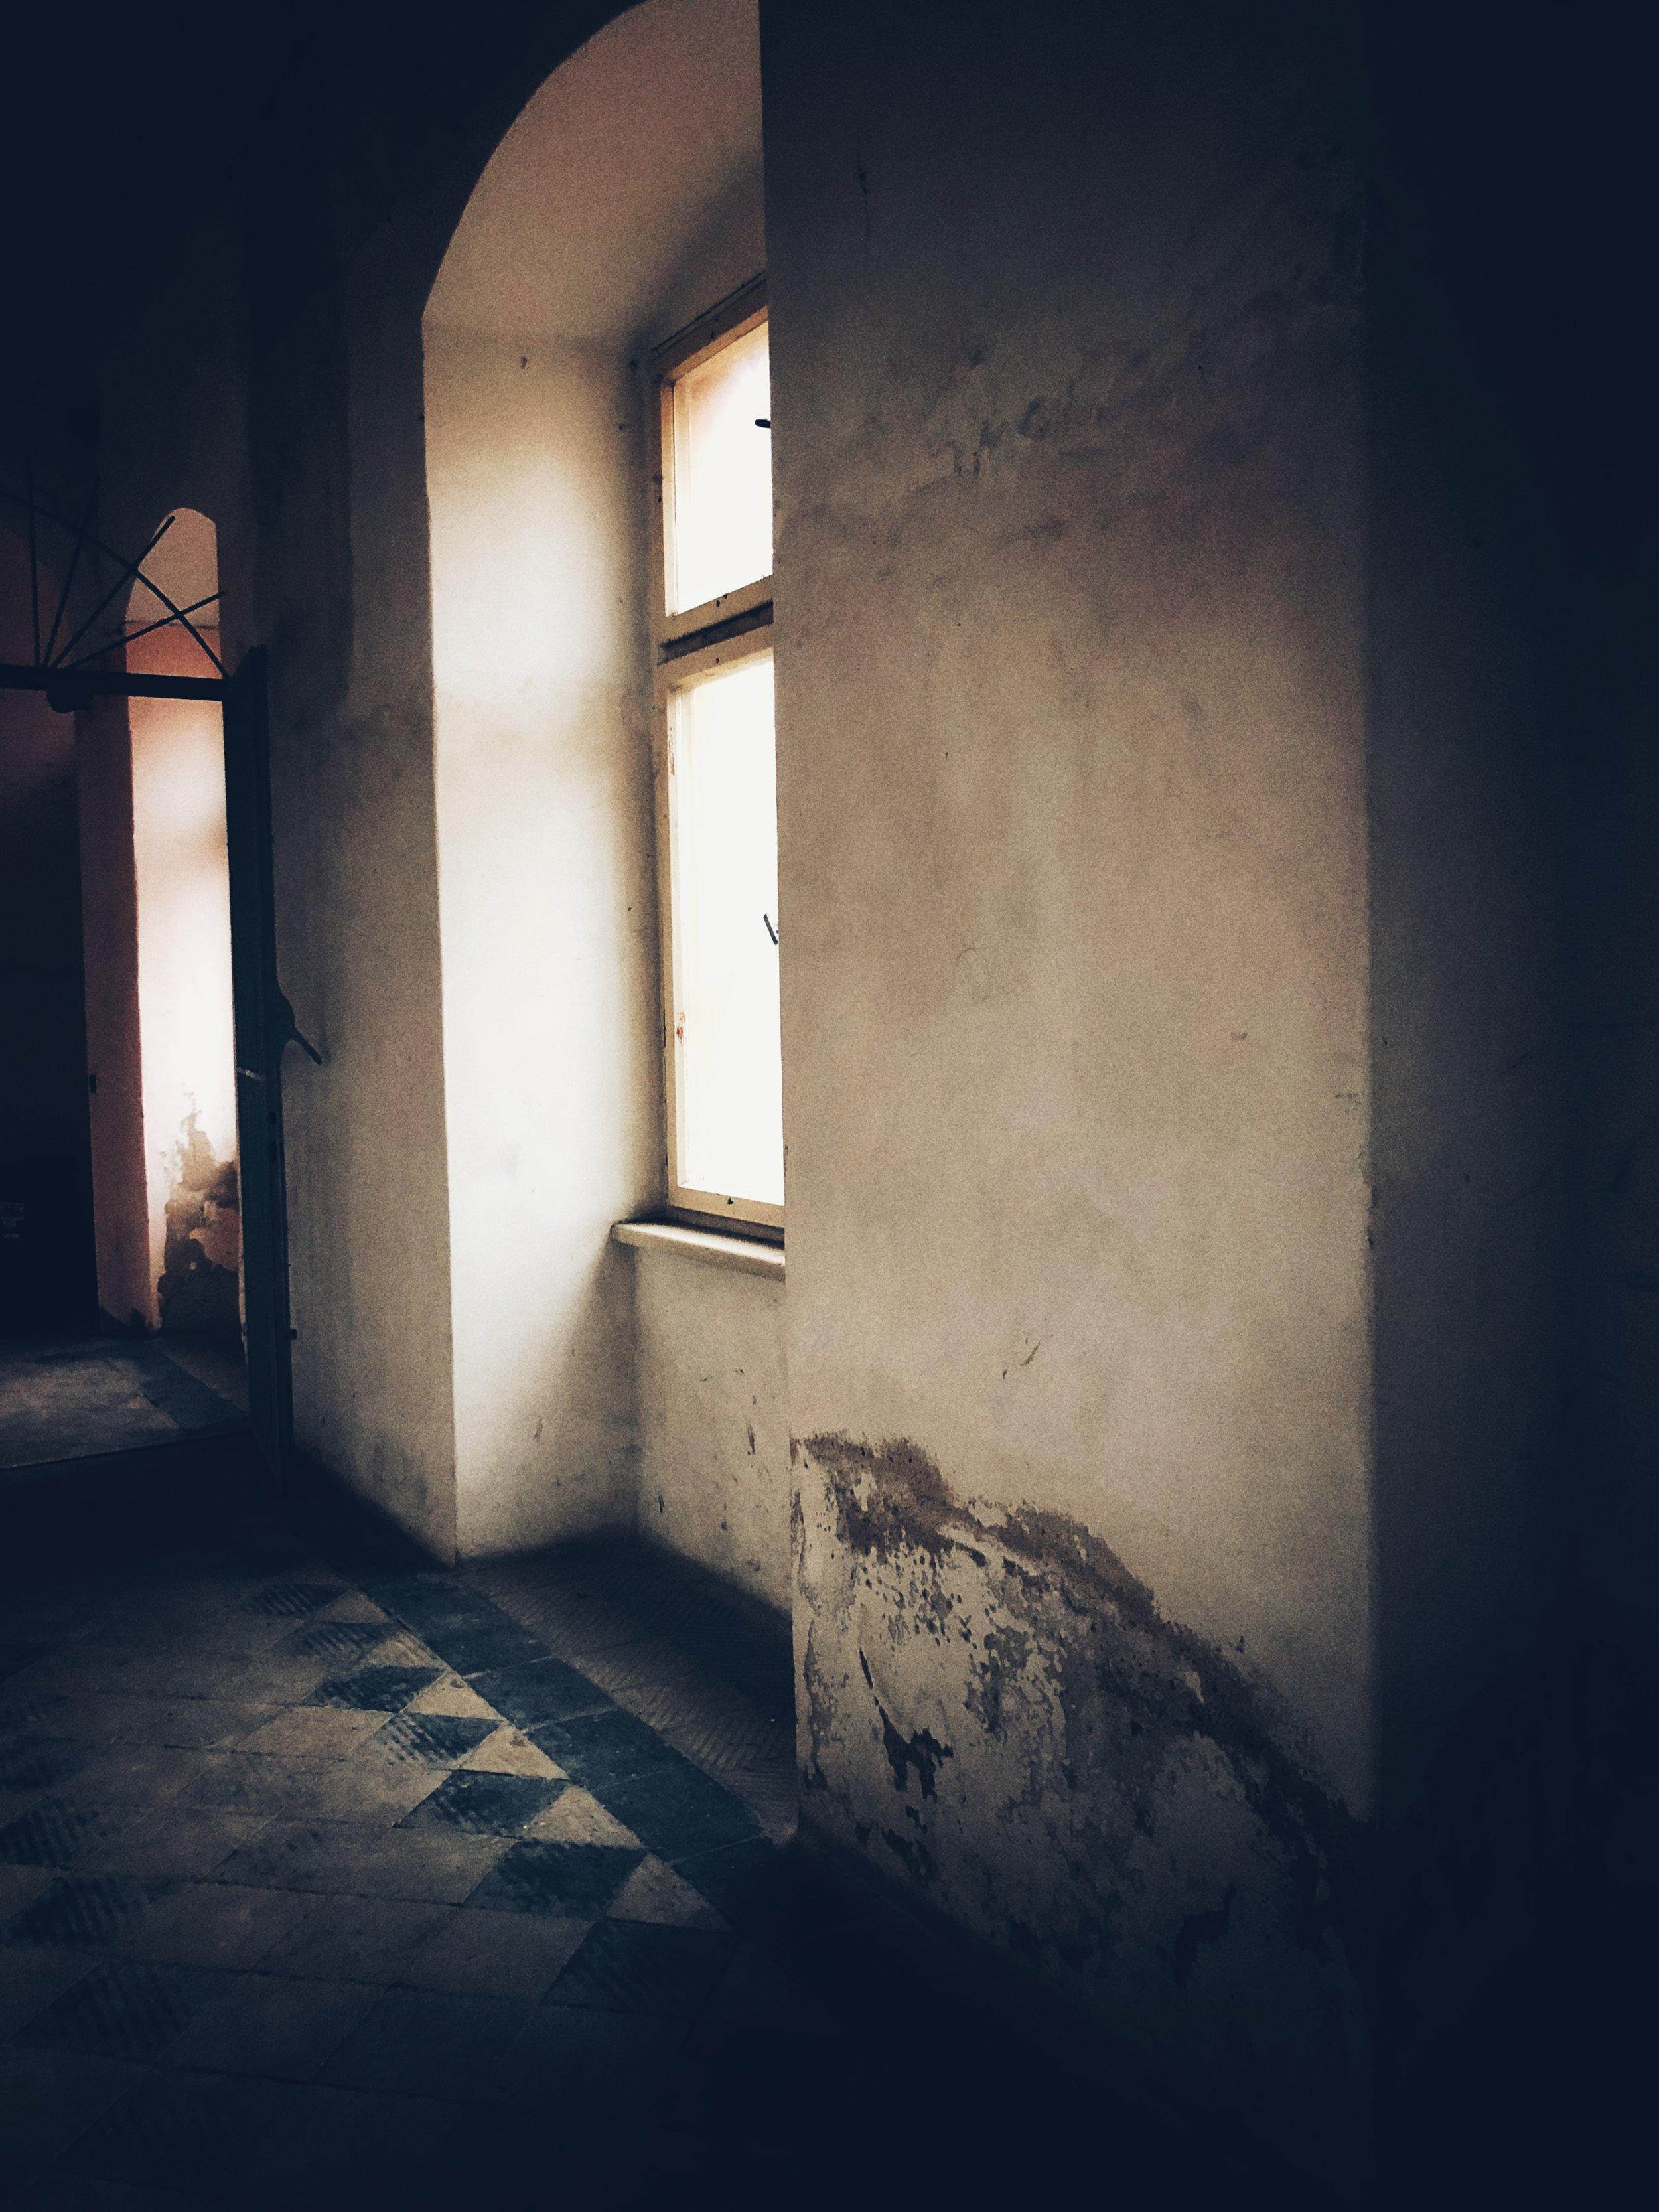 prisoner's barracks hallway